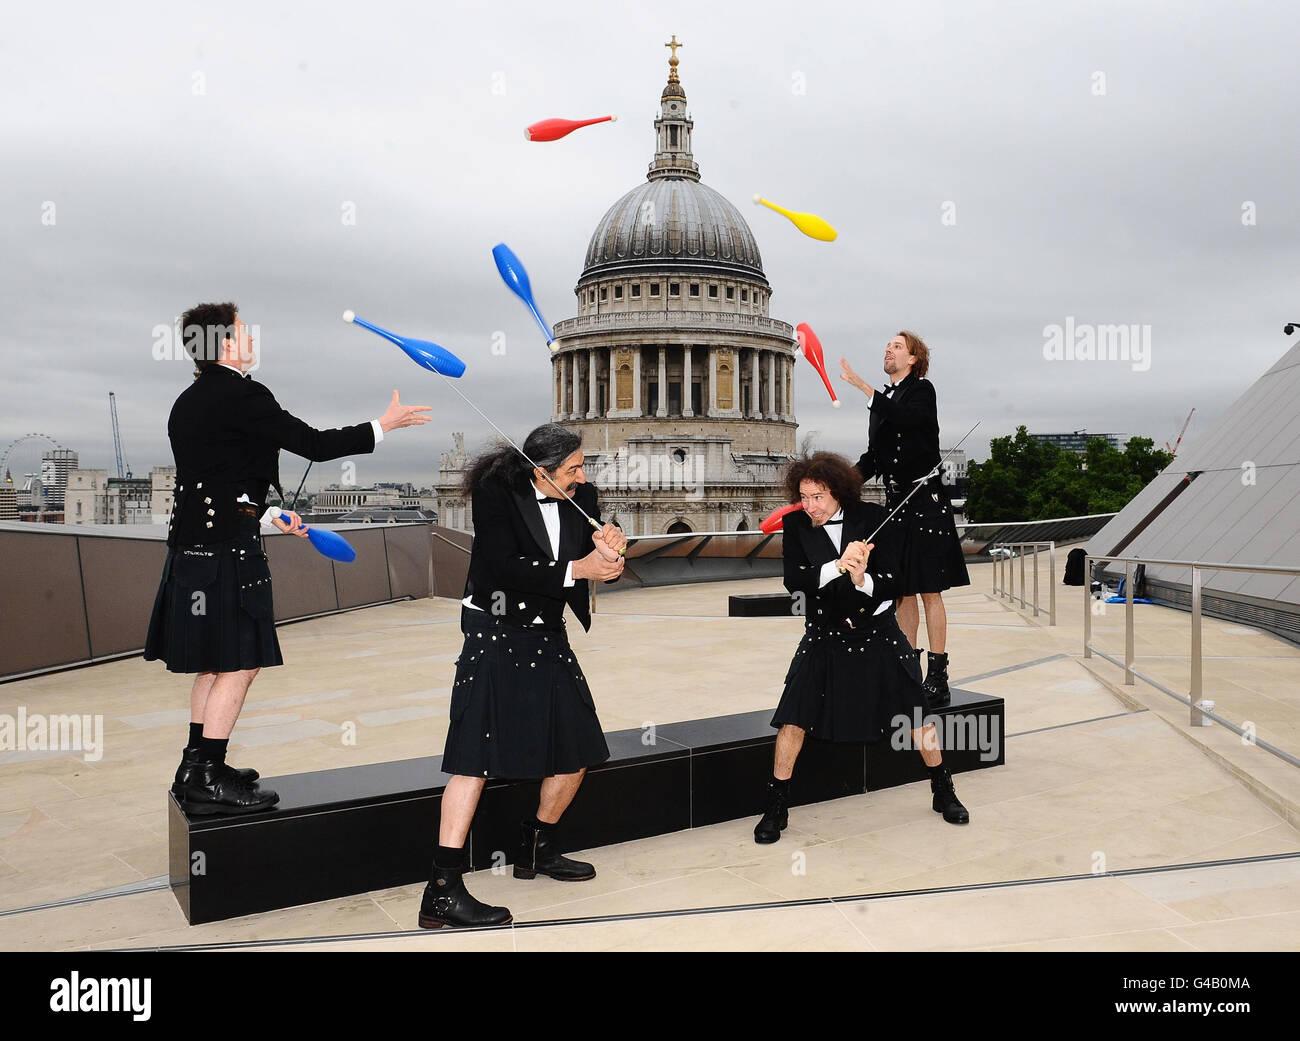 The Flying Karamazov Brothers - London - Stock Image